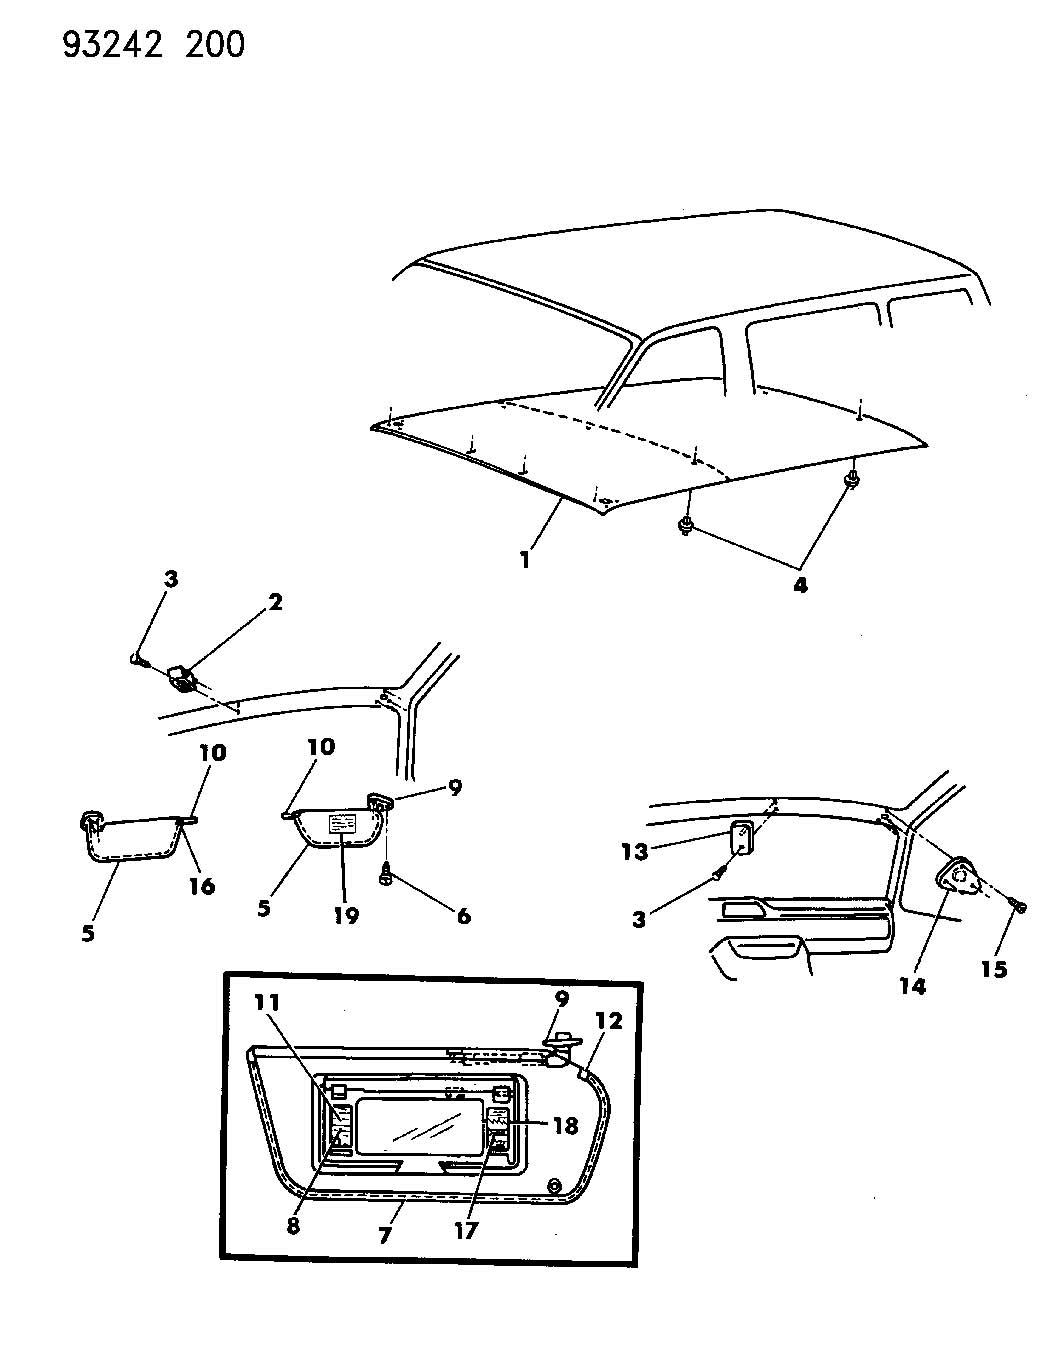 dodge grand caravan parts diagram questions on sets and venn diagrams 2003 mairap